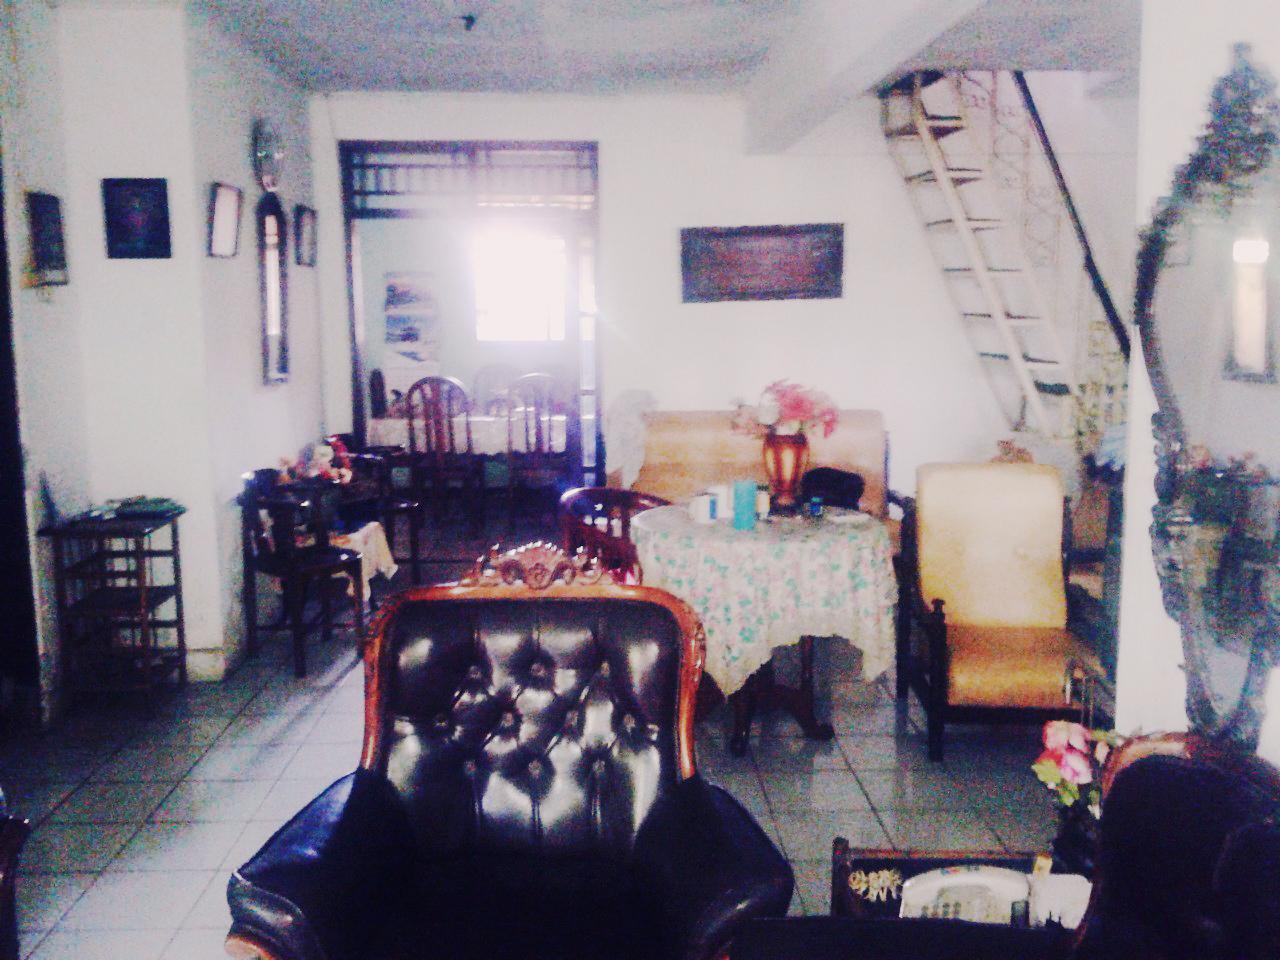 Rumah Bagus Di Permata Hijau, Komp Perindustrian, Kebayoran Lama